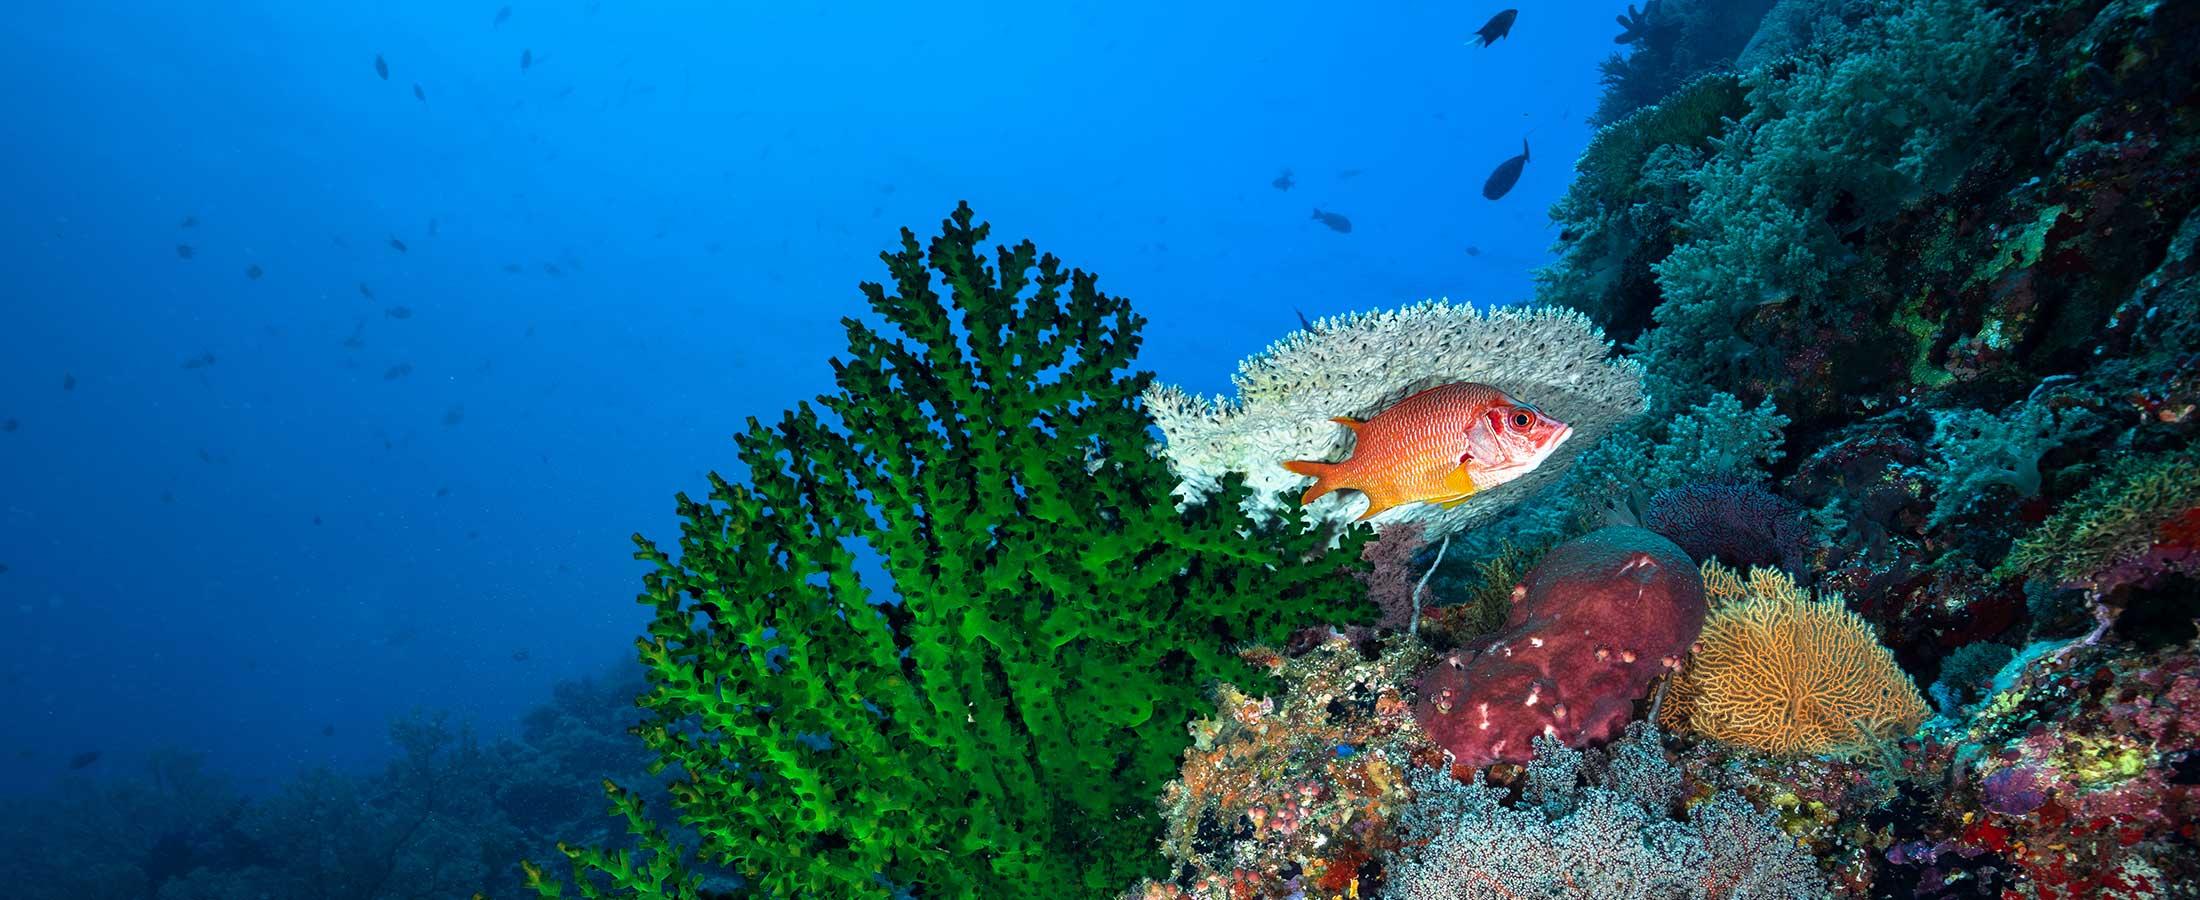 snapshot dive site